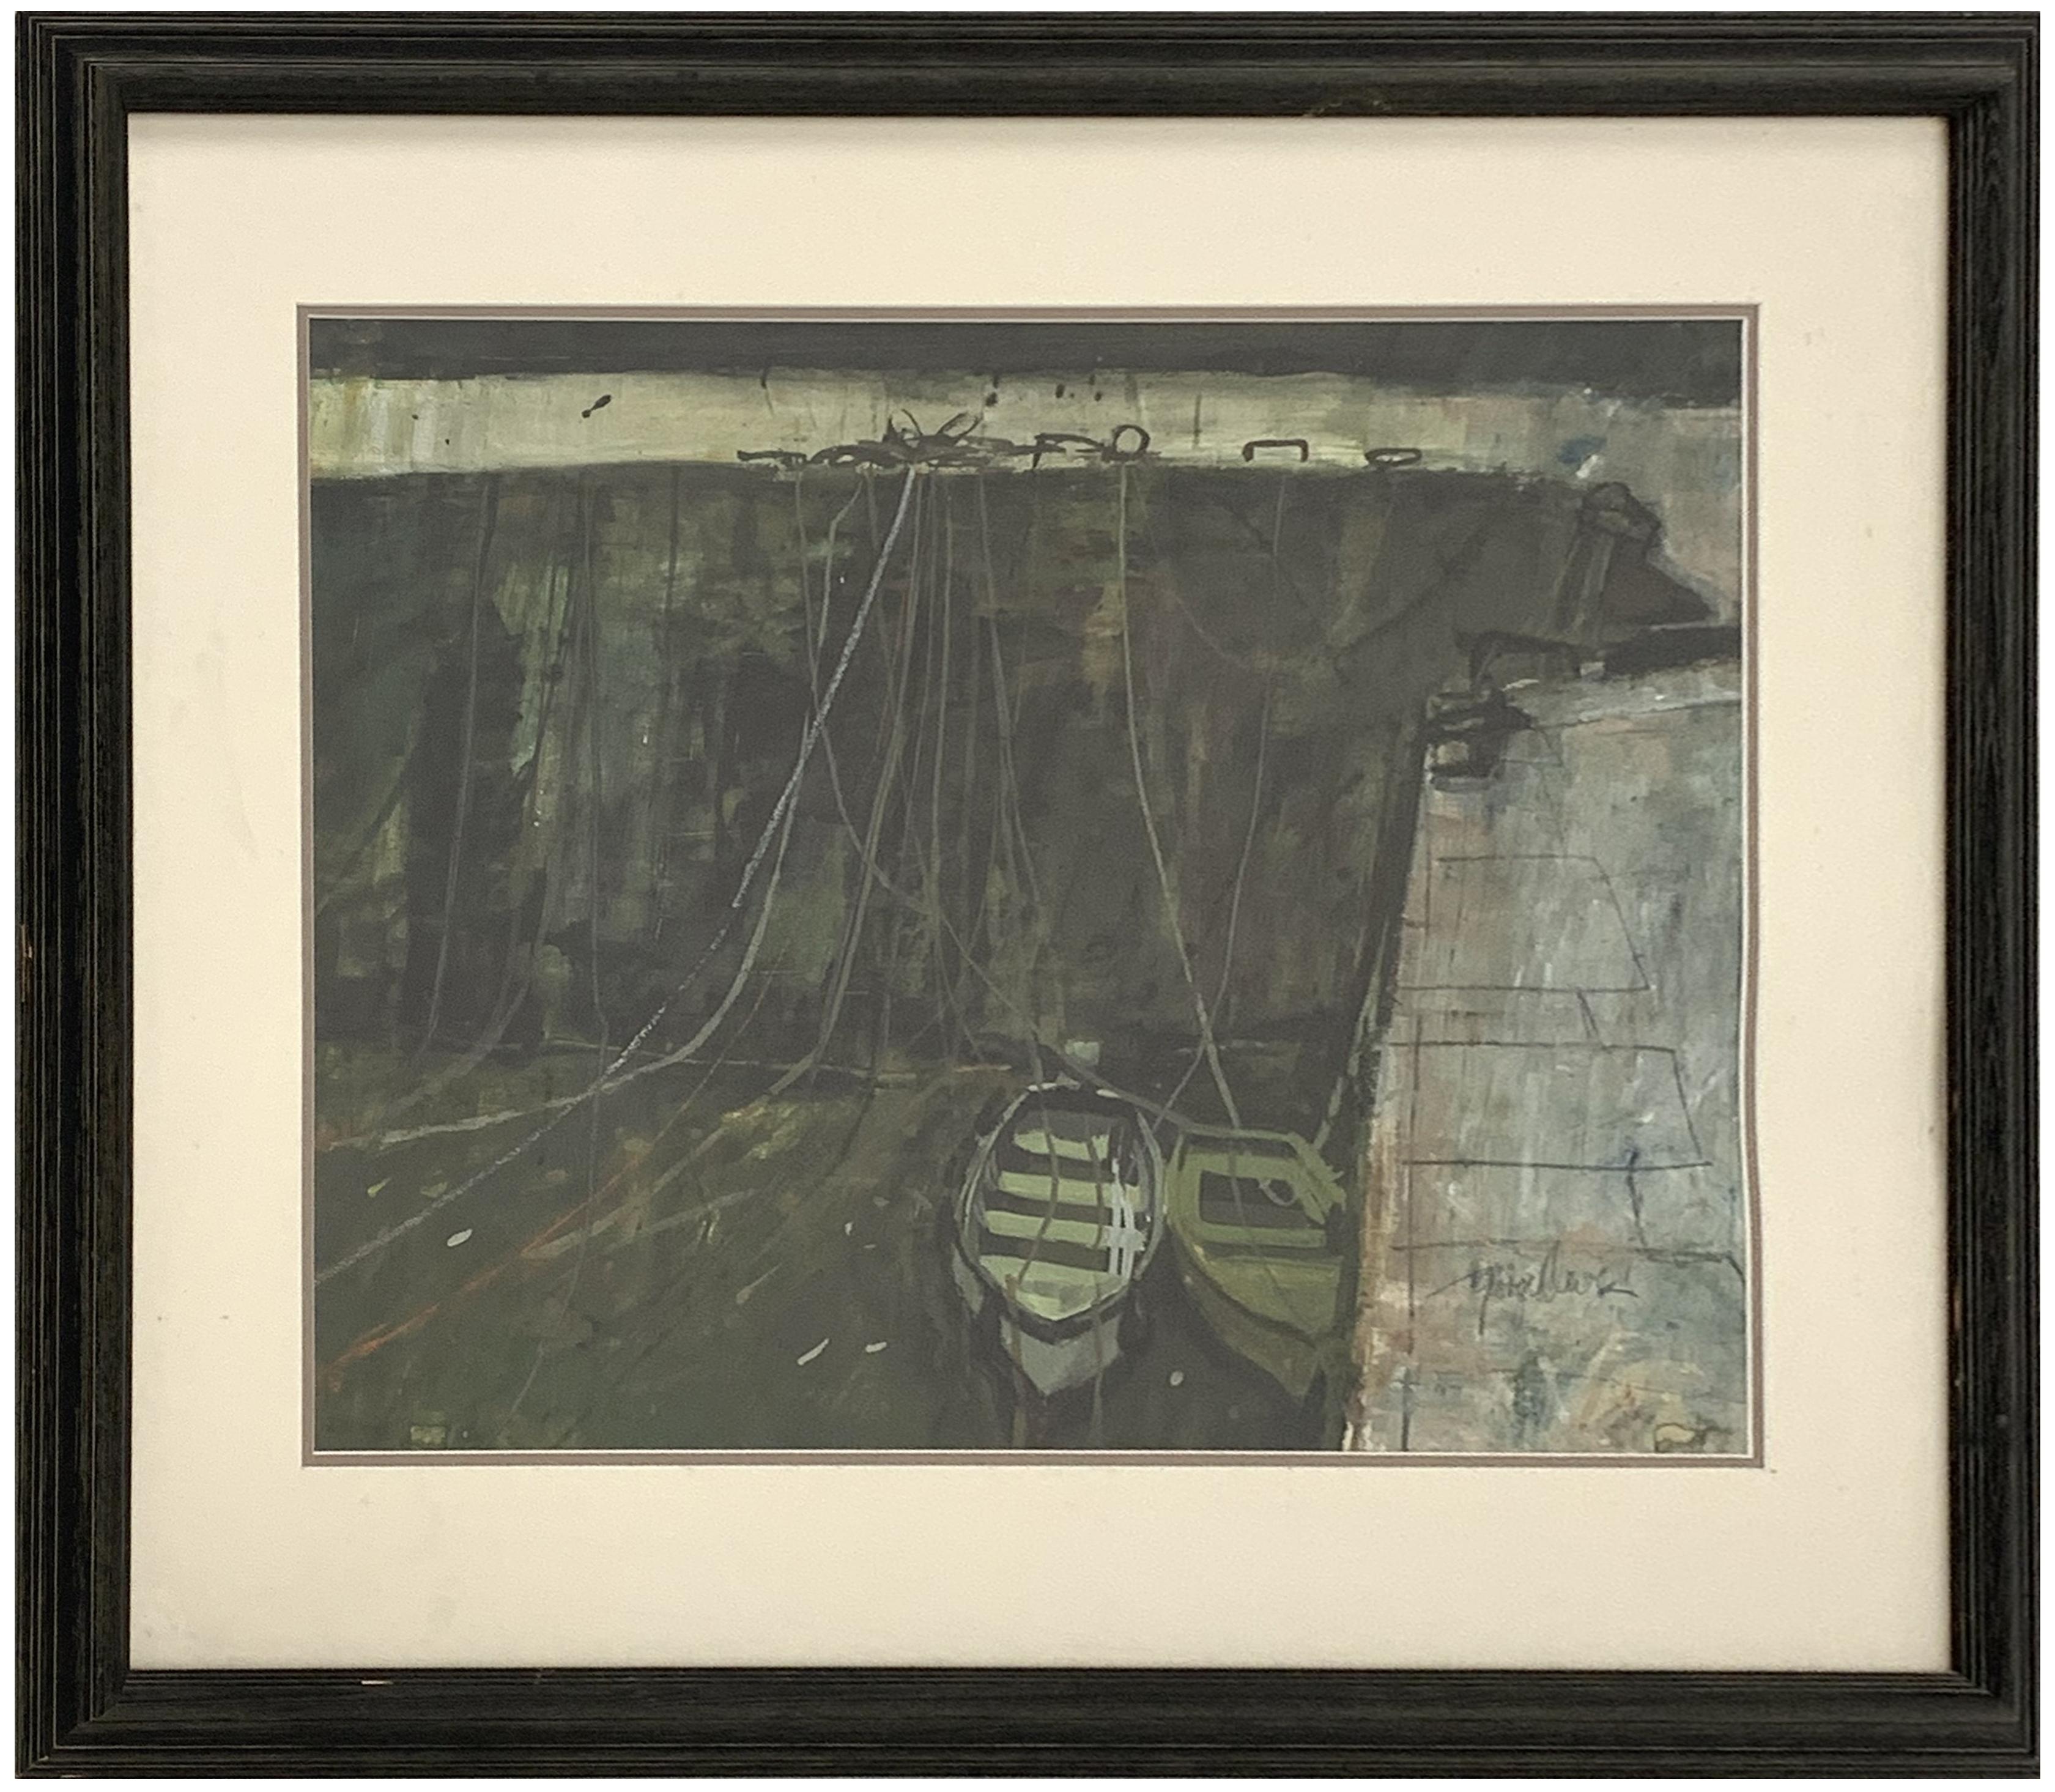 George Devlin (Scottish 1937-2014): Boats at Port-Vendres - Image 2 of 3